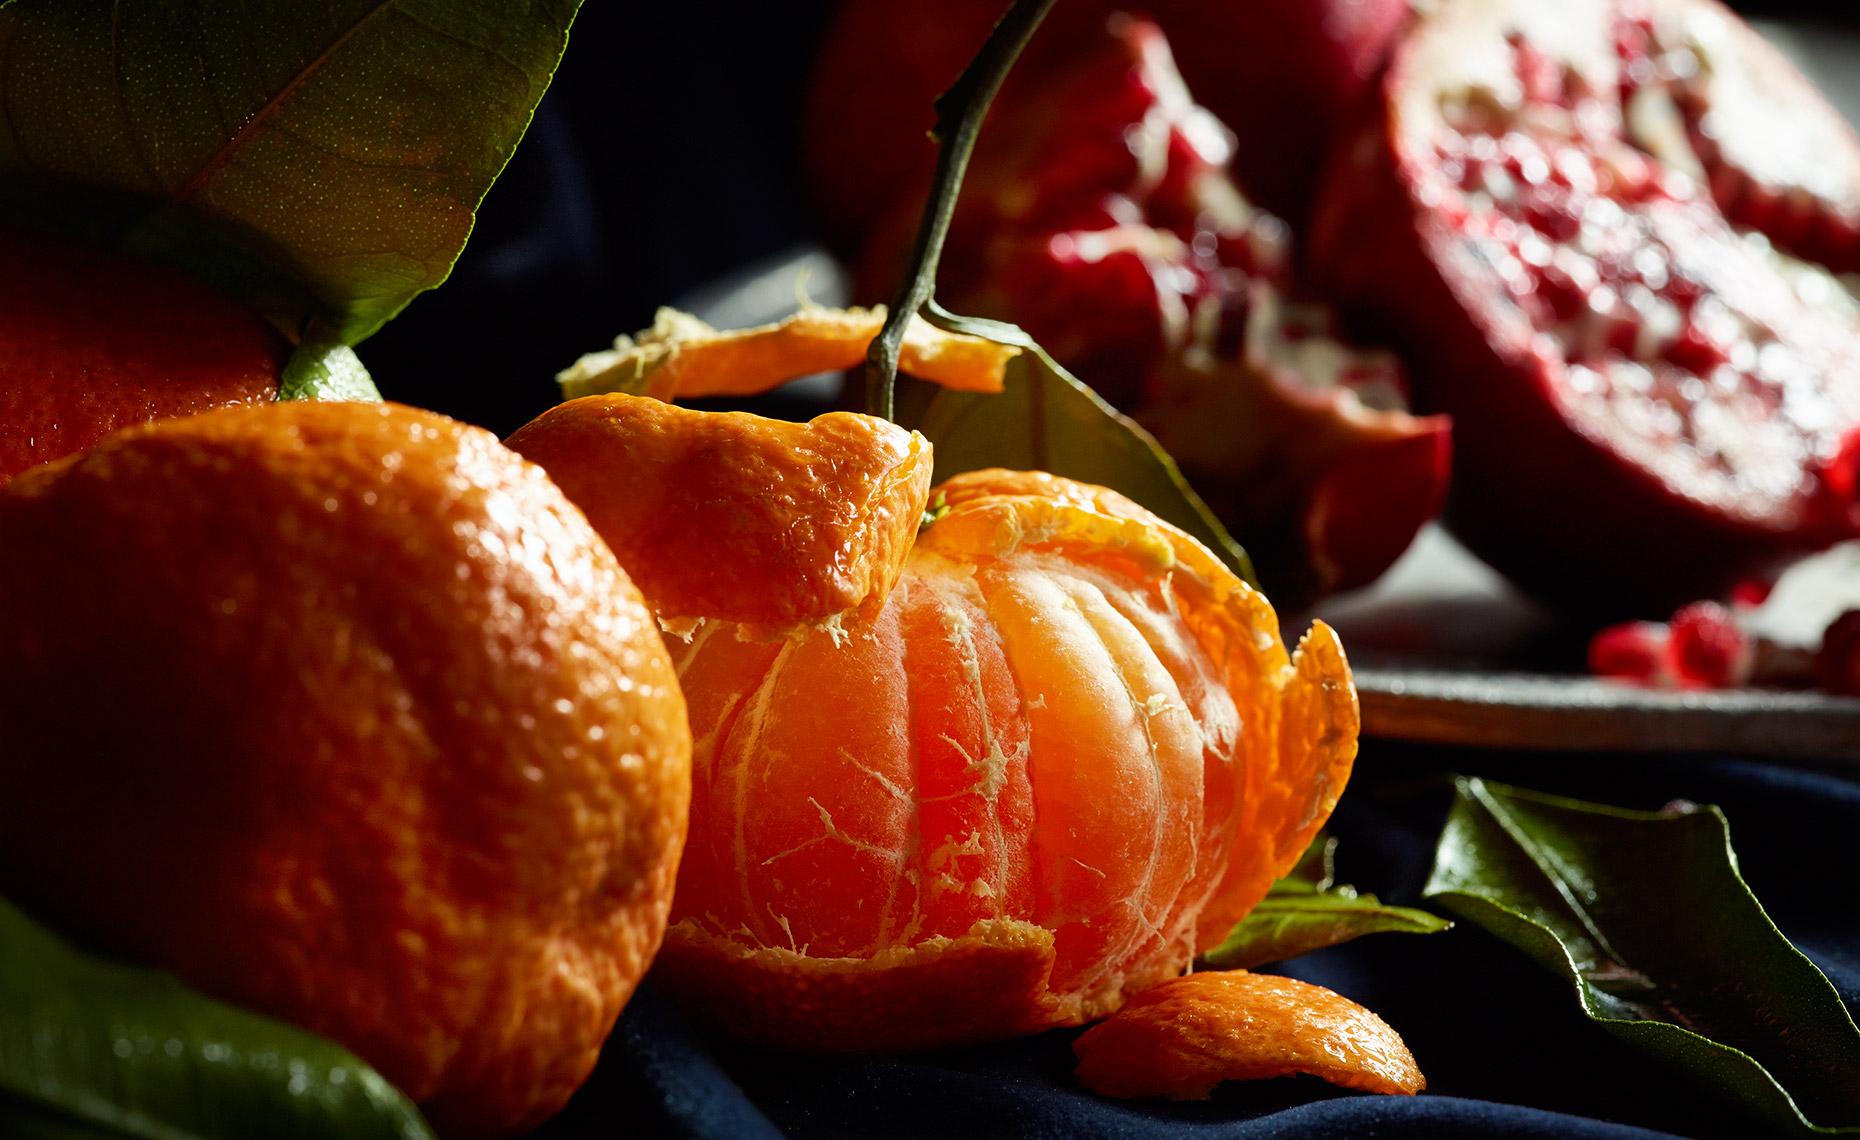 04-flemish-birds-oranges-web-wide.jpg